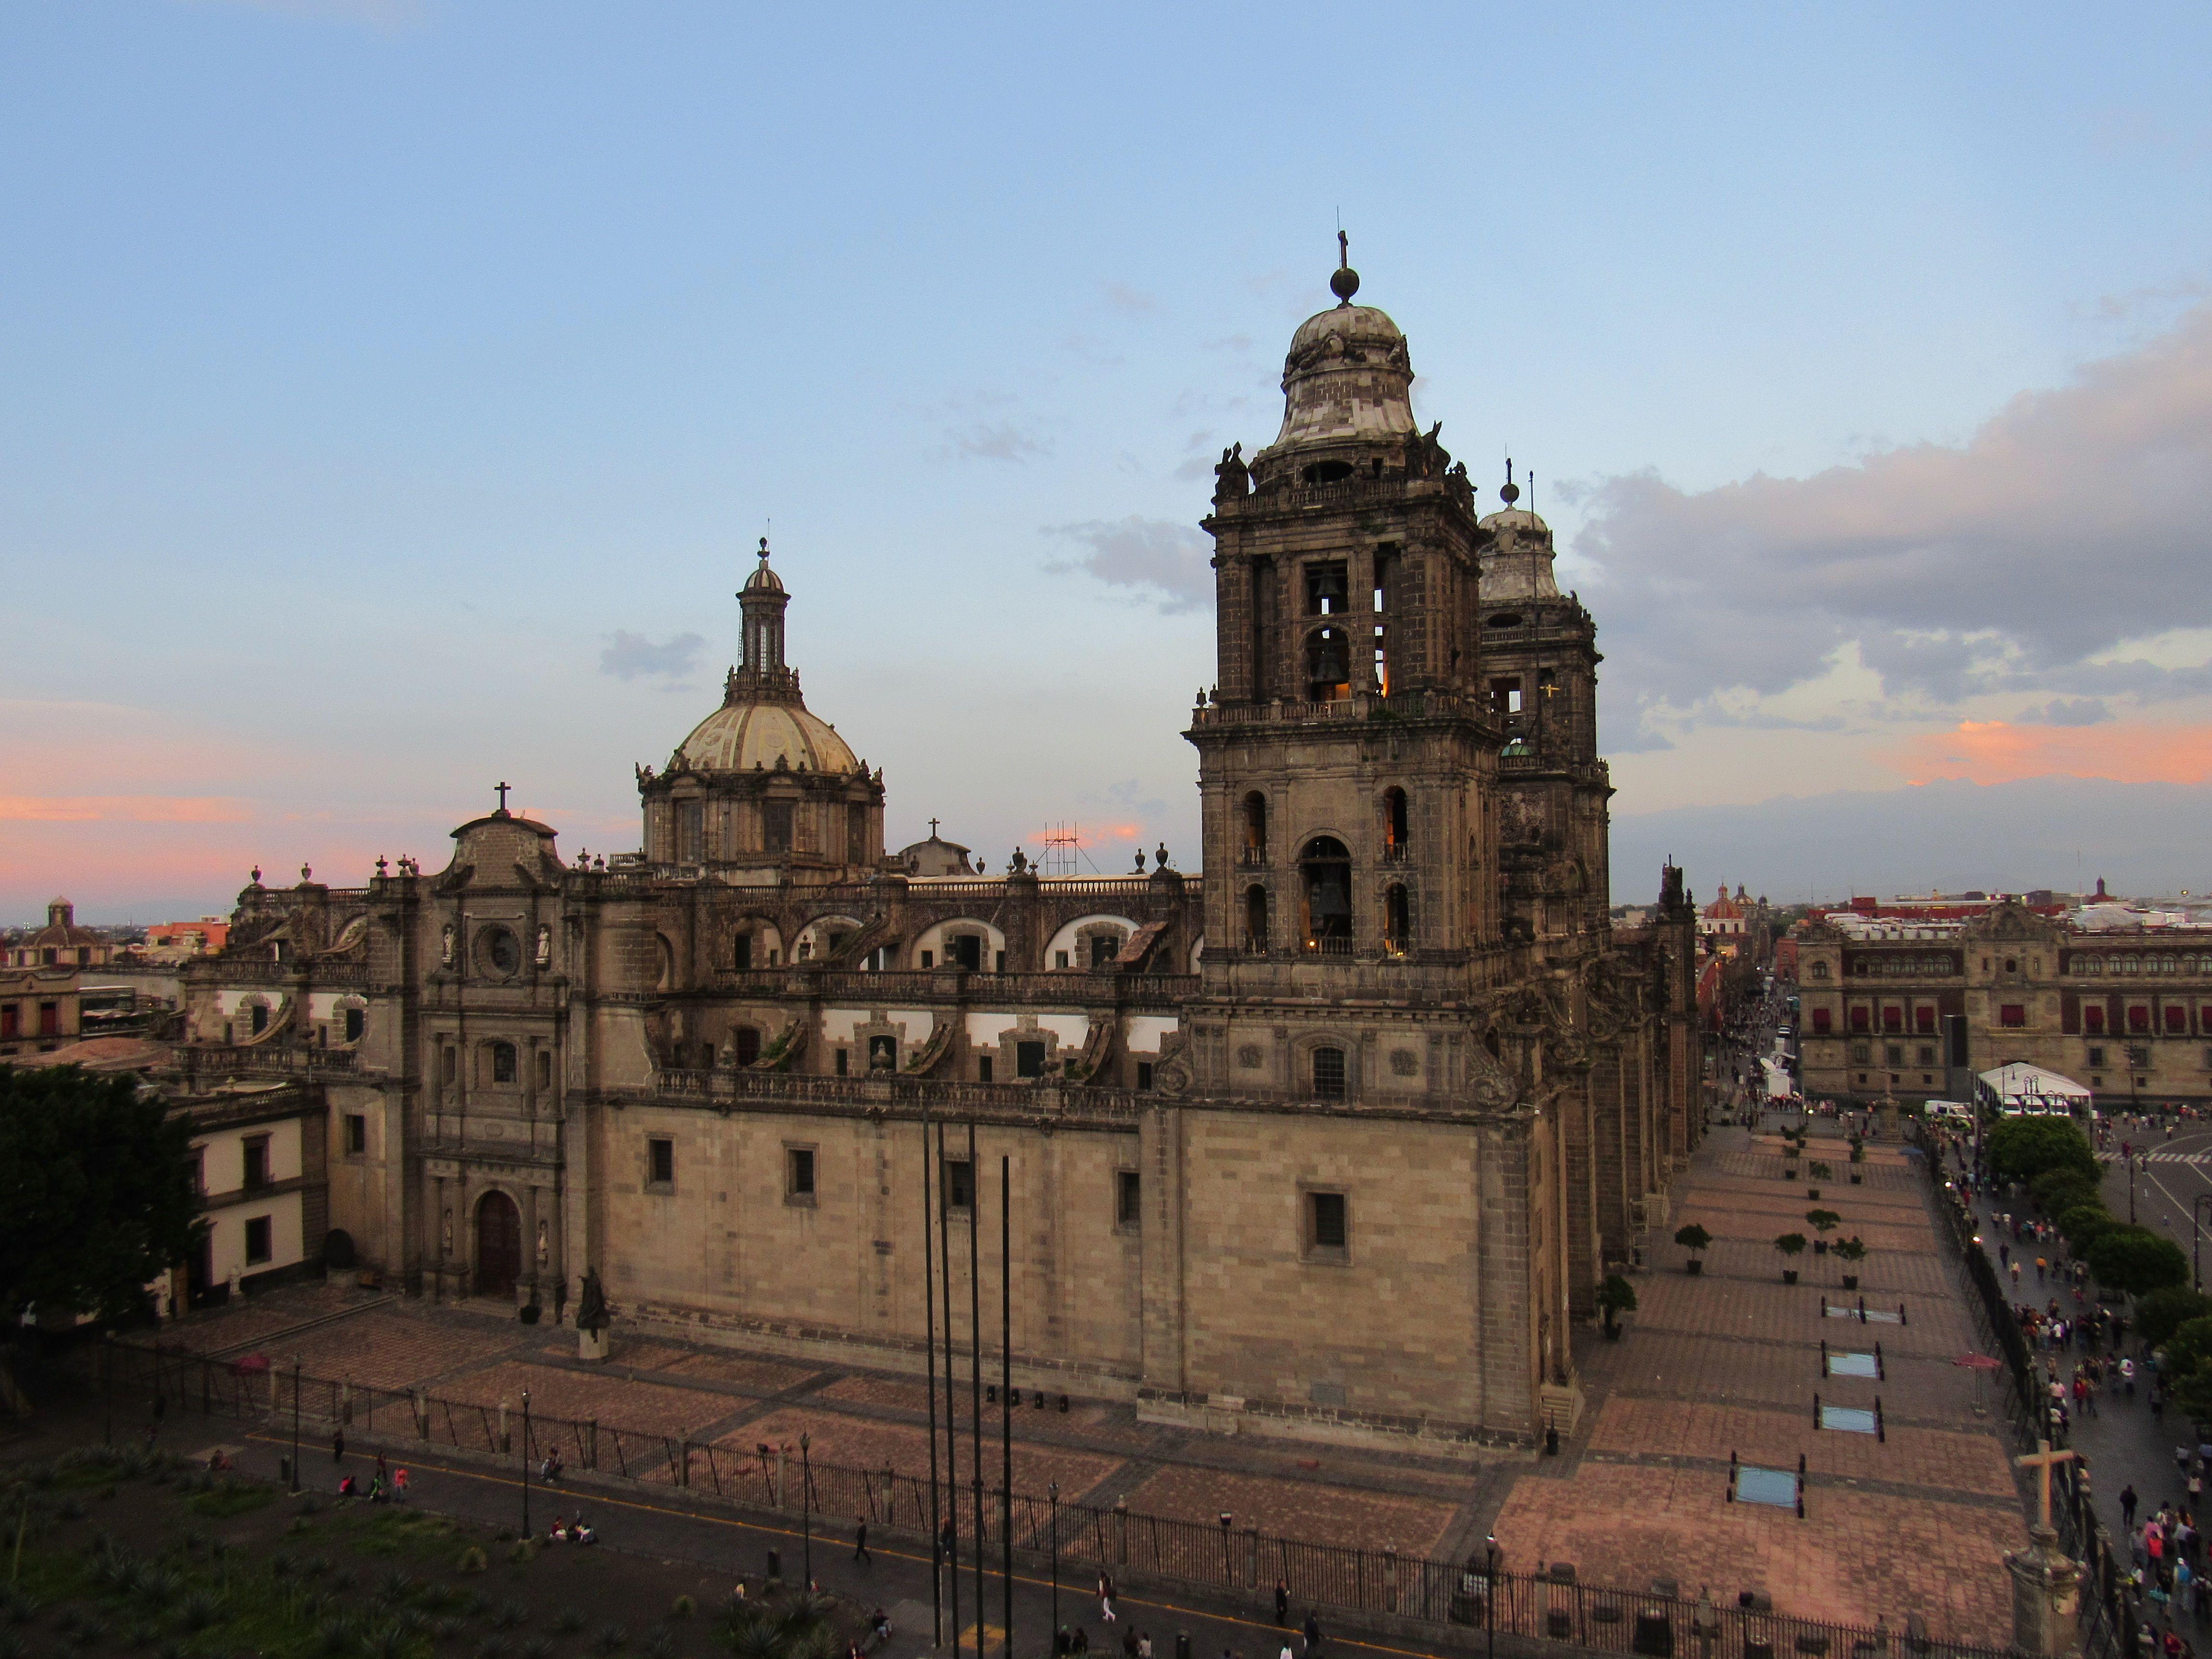 Pin De Roman En Cool Pics By Me Viajes En Mexico Viajes Morelia Mexico